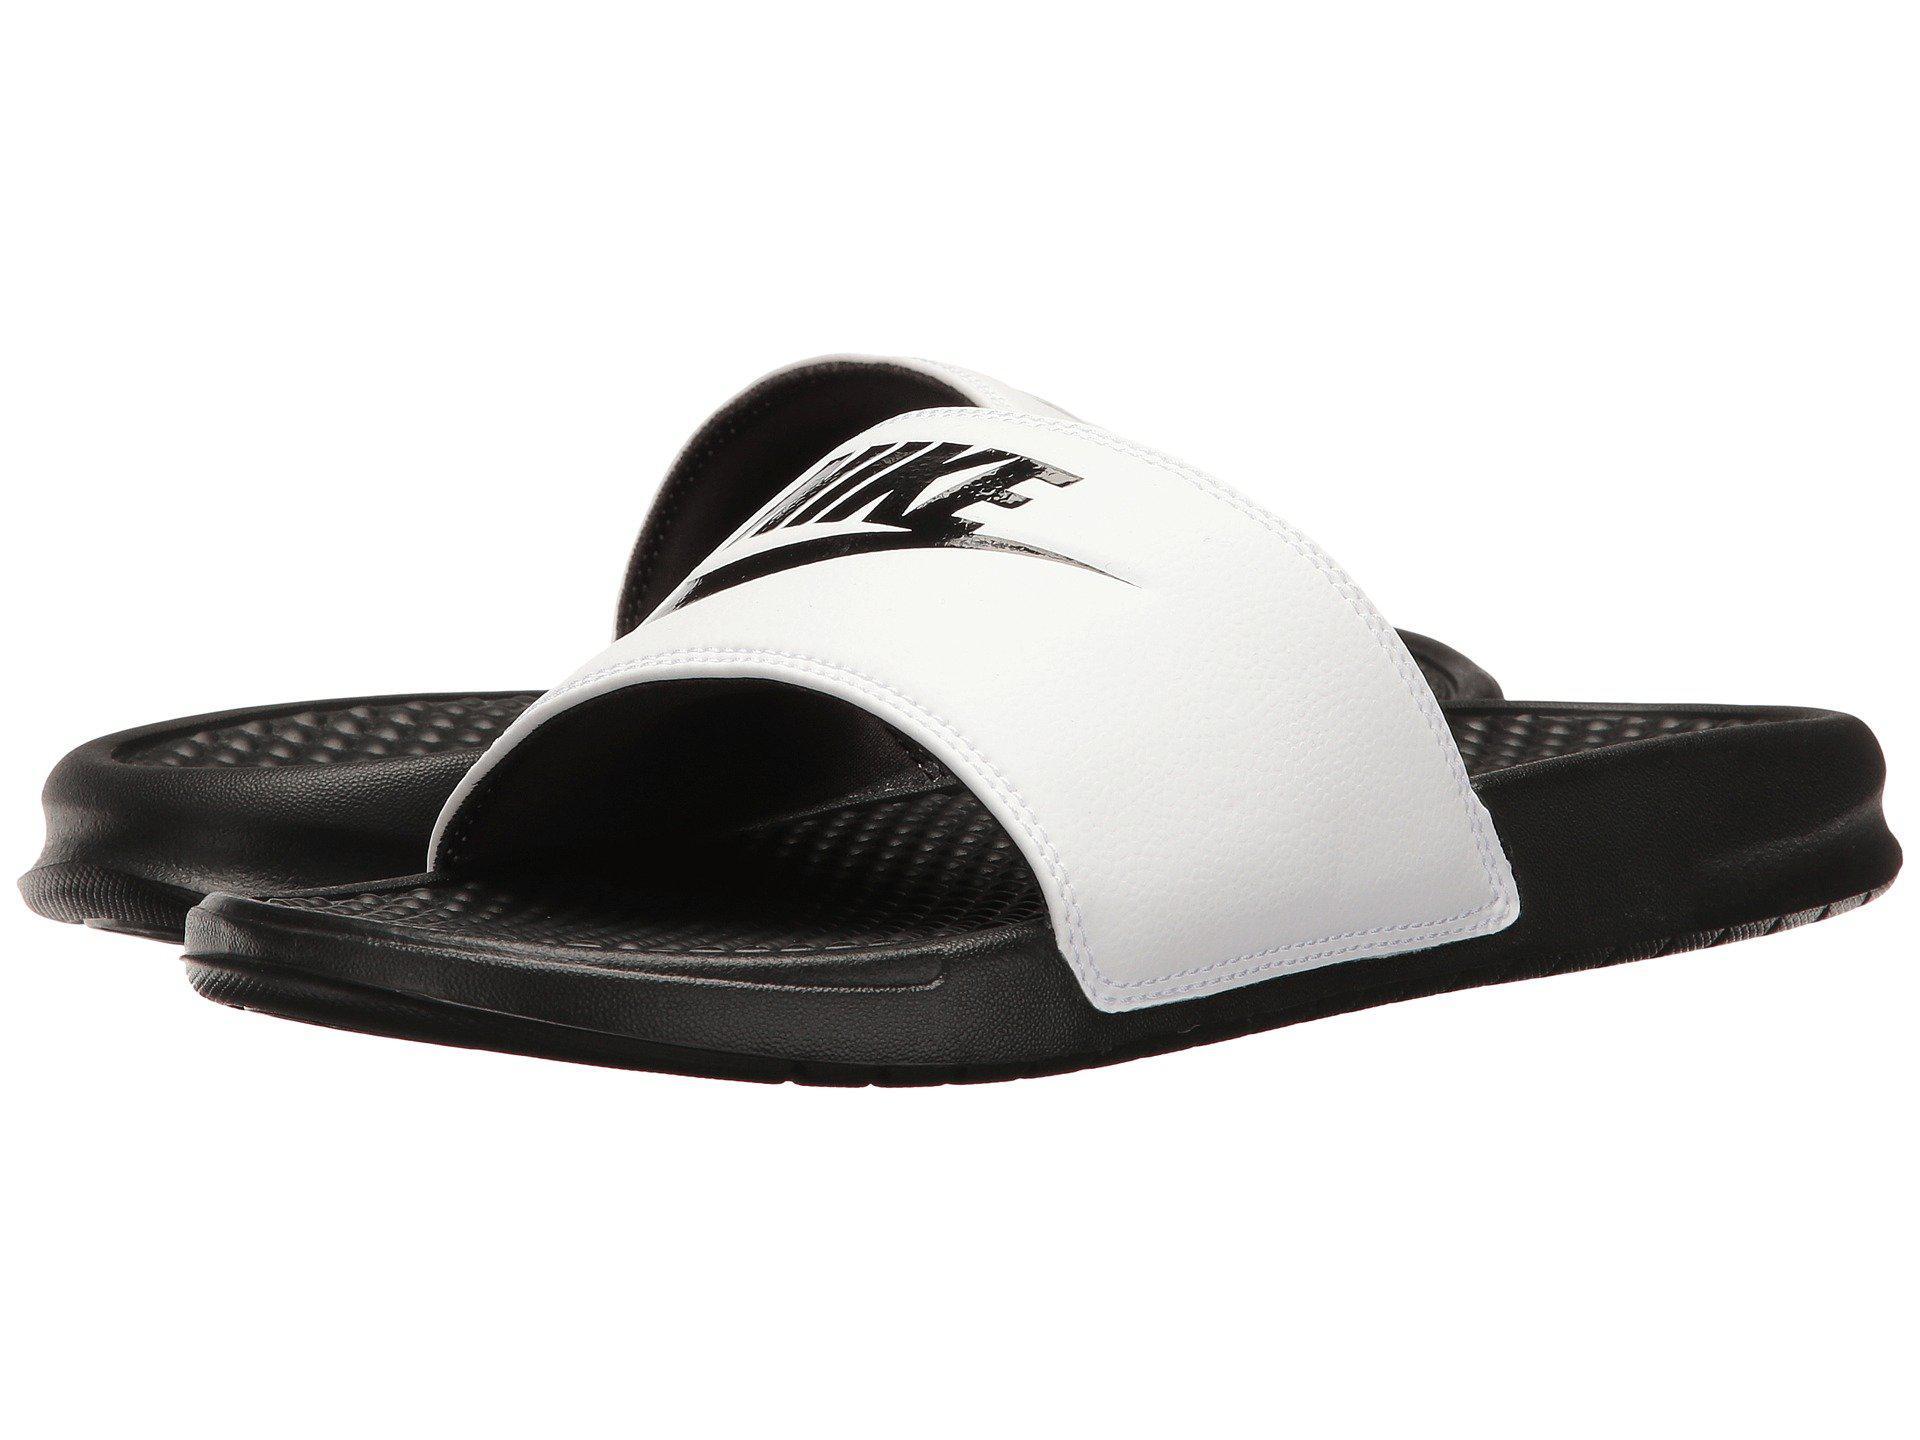 2a5f4640f1e7 Lyst - Nike Benassi Jdi Slide (black white) Men s Slide Shoes in ...